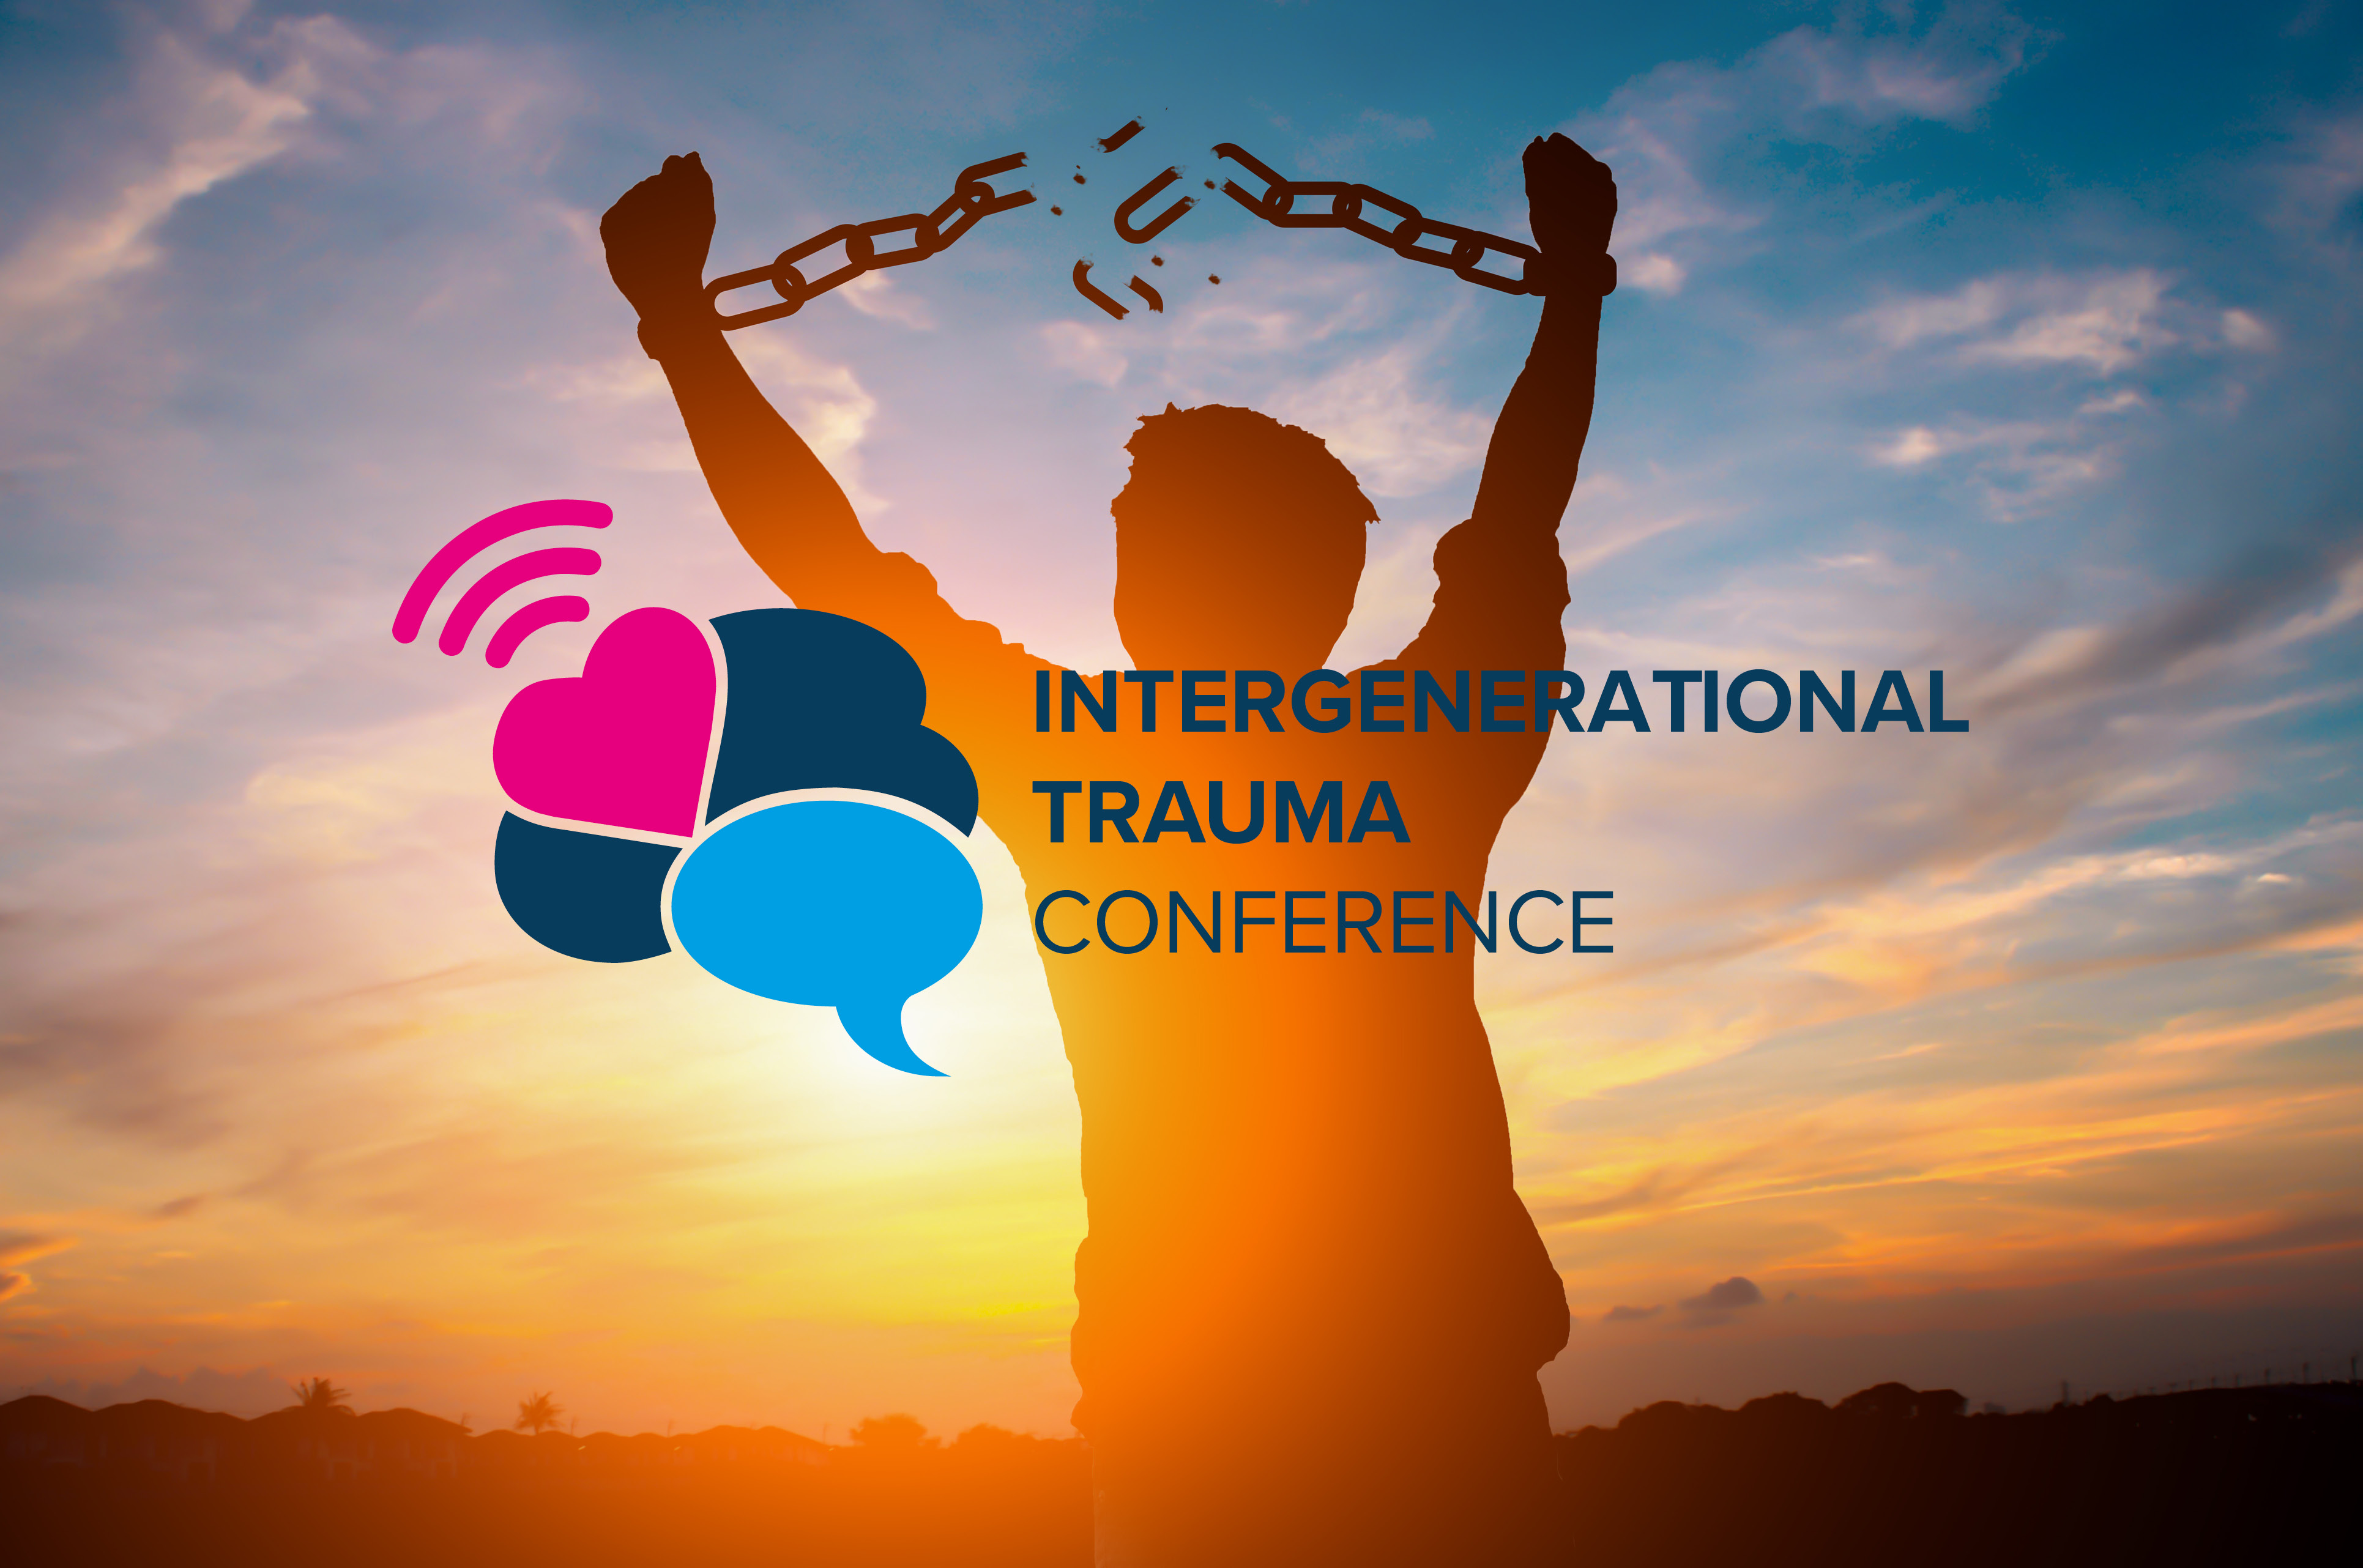 Intergenerational Trauma Conference (Virtual Event)